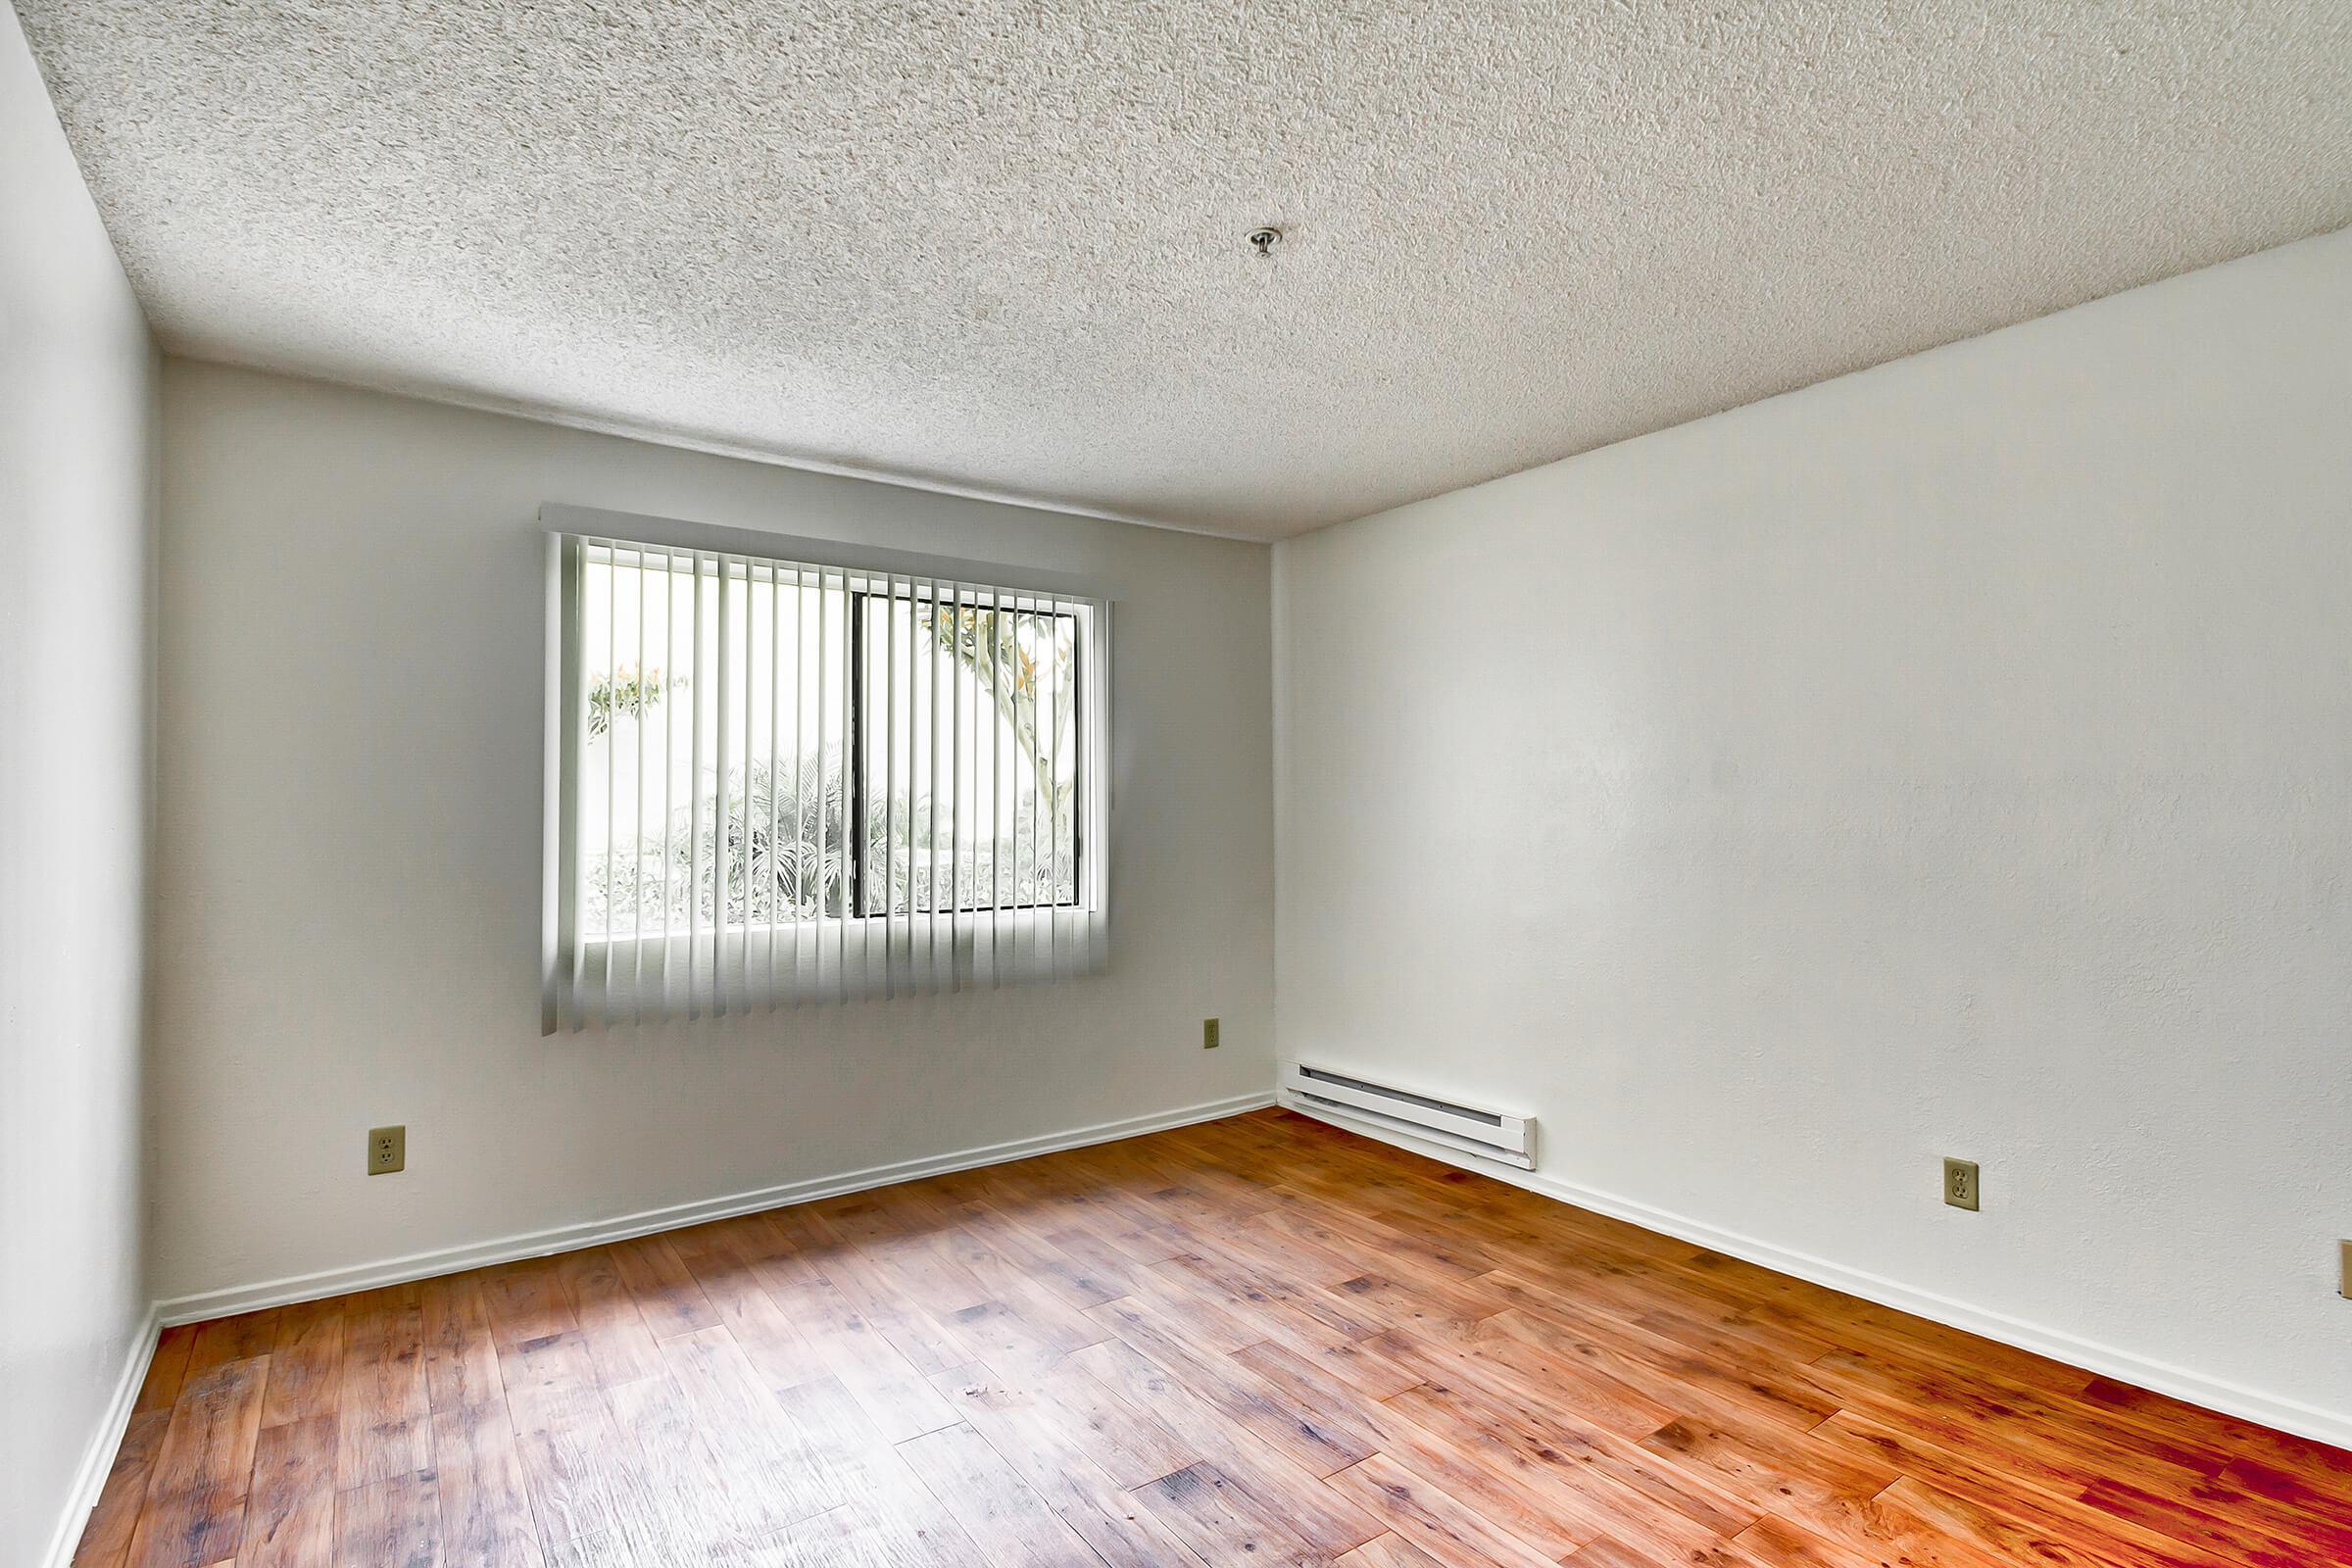 Bedroom_575-W-19Th-St-Costa-Mesa-CA_Park-Center-Place_RPI_II-280960-55.jpg